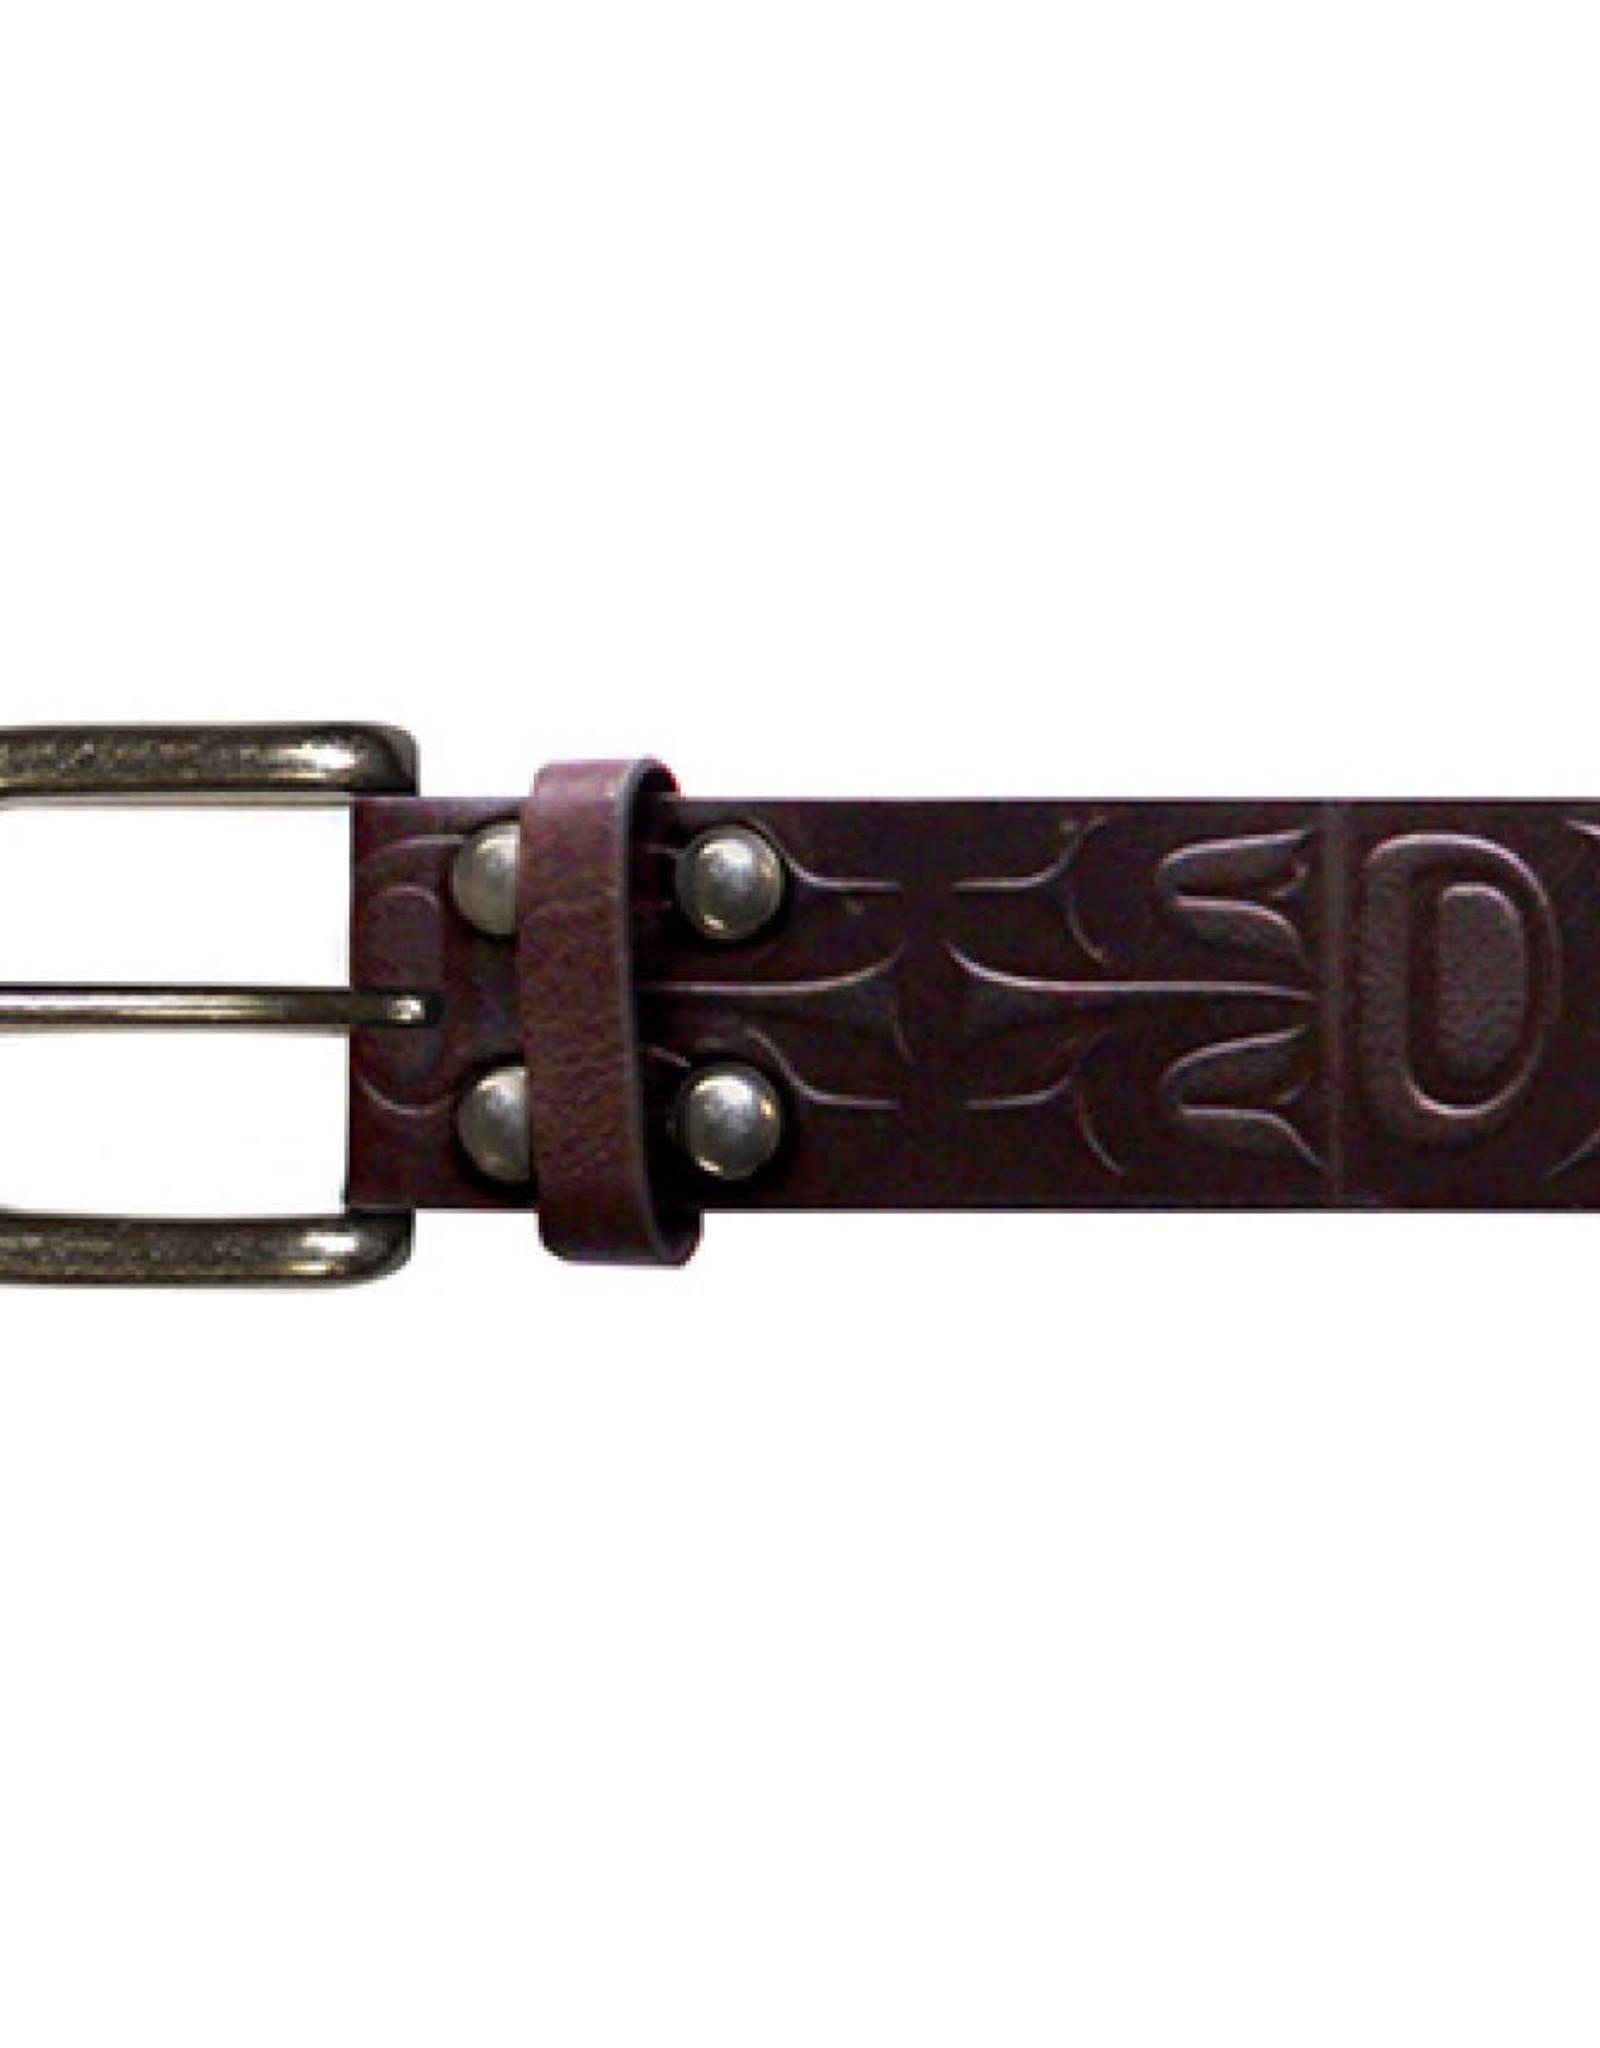 Leather Belt Size XL-Eagle by Corey Bulpitt